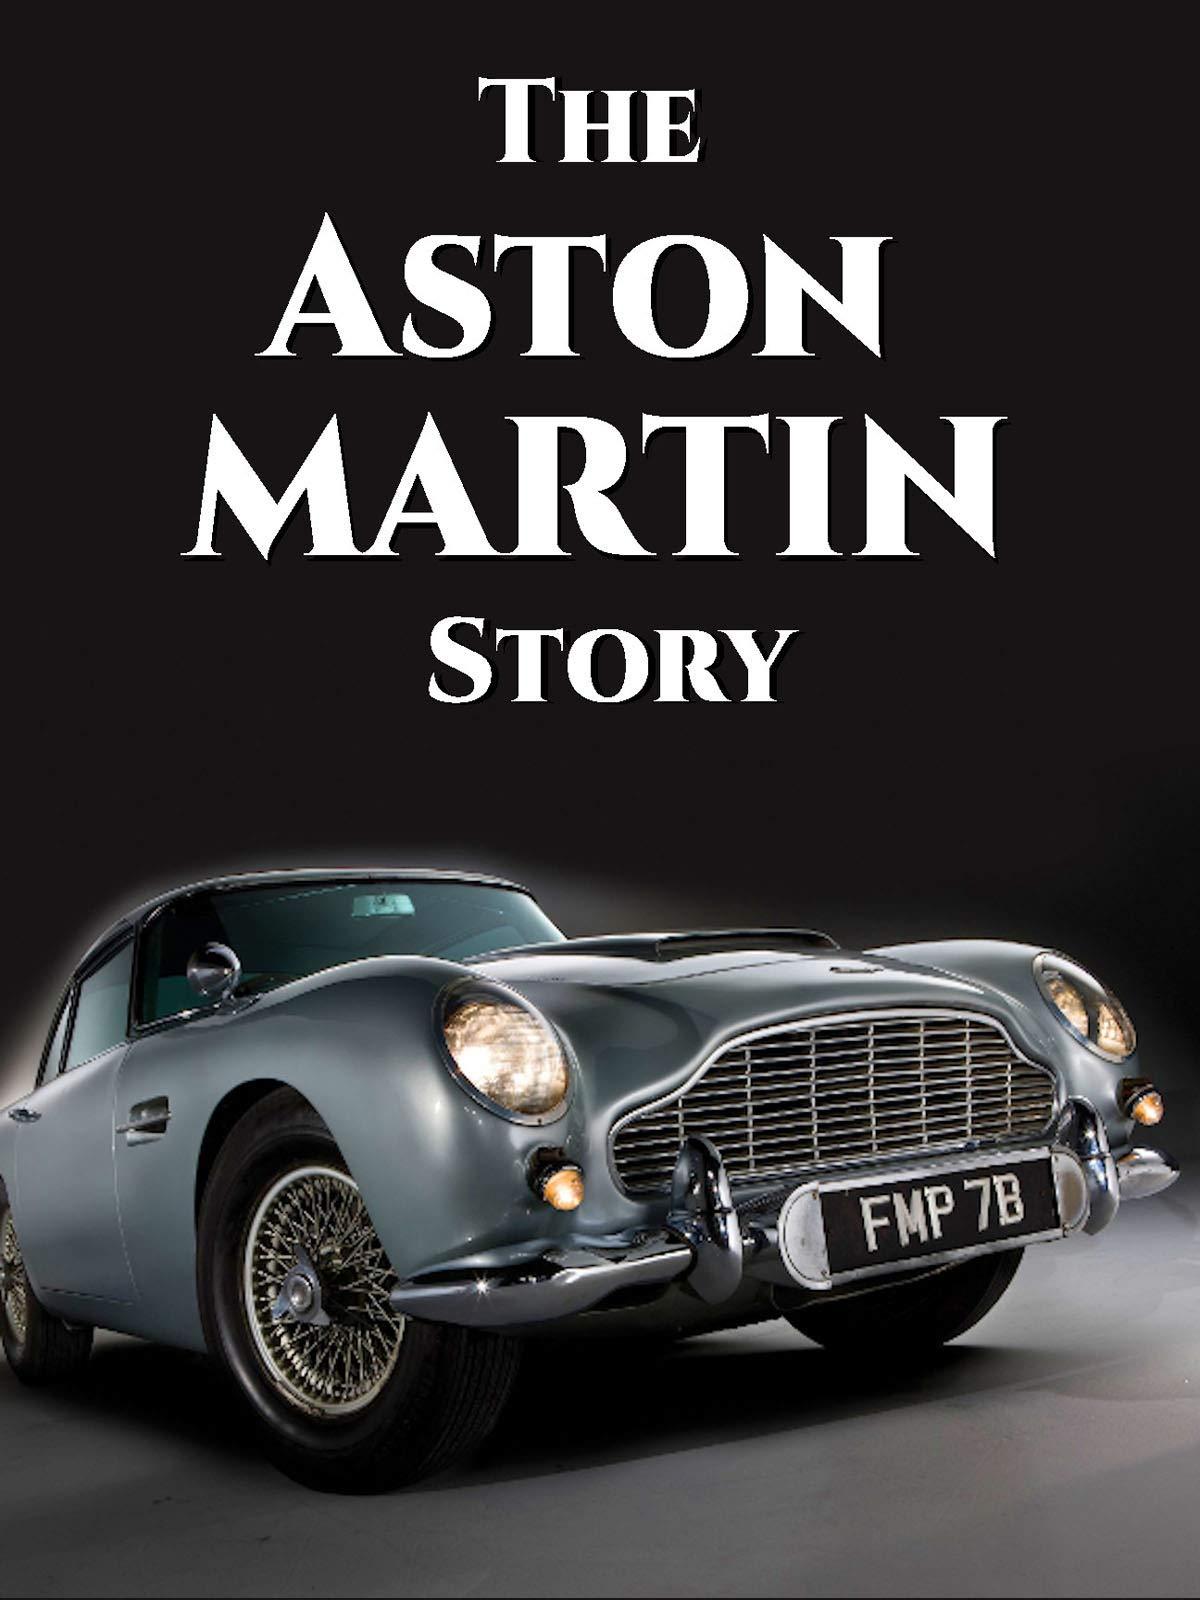 The Aston Martin Story